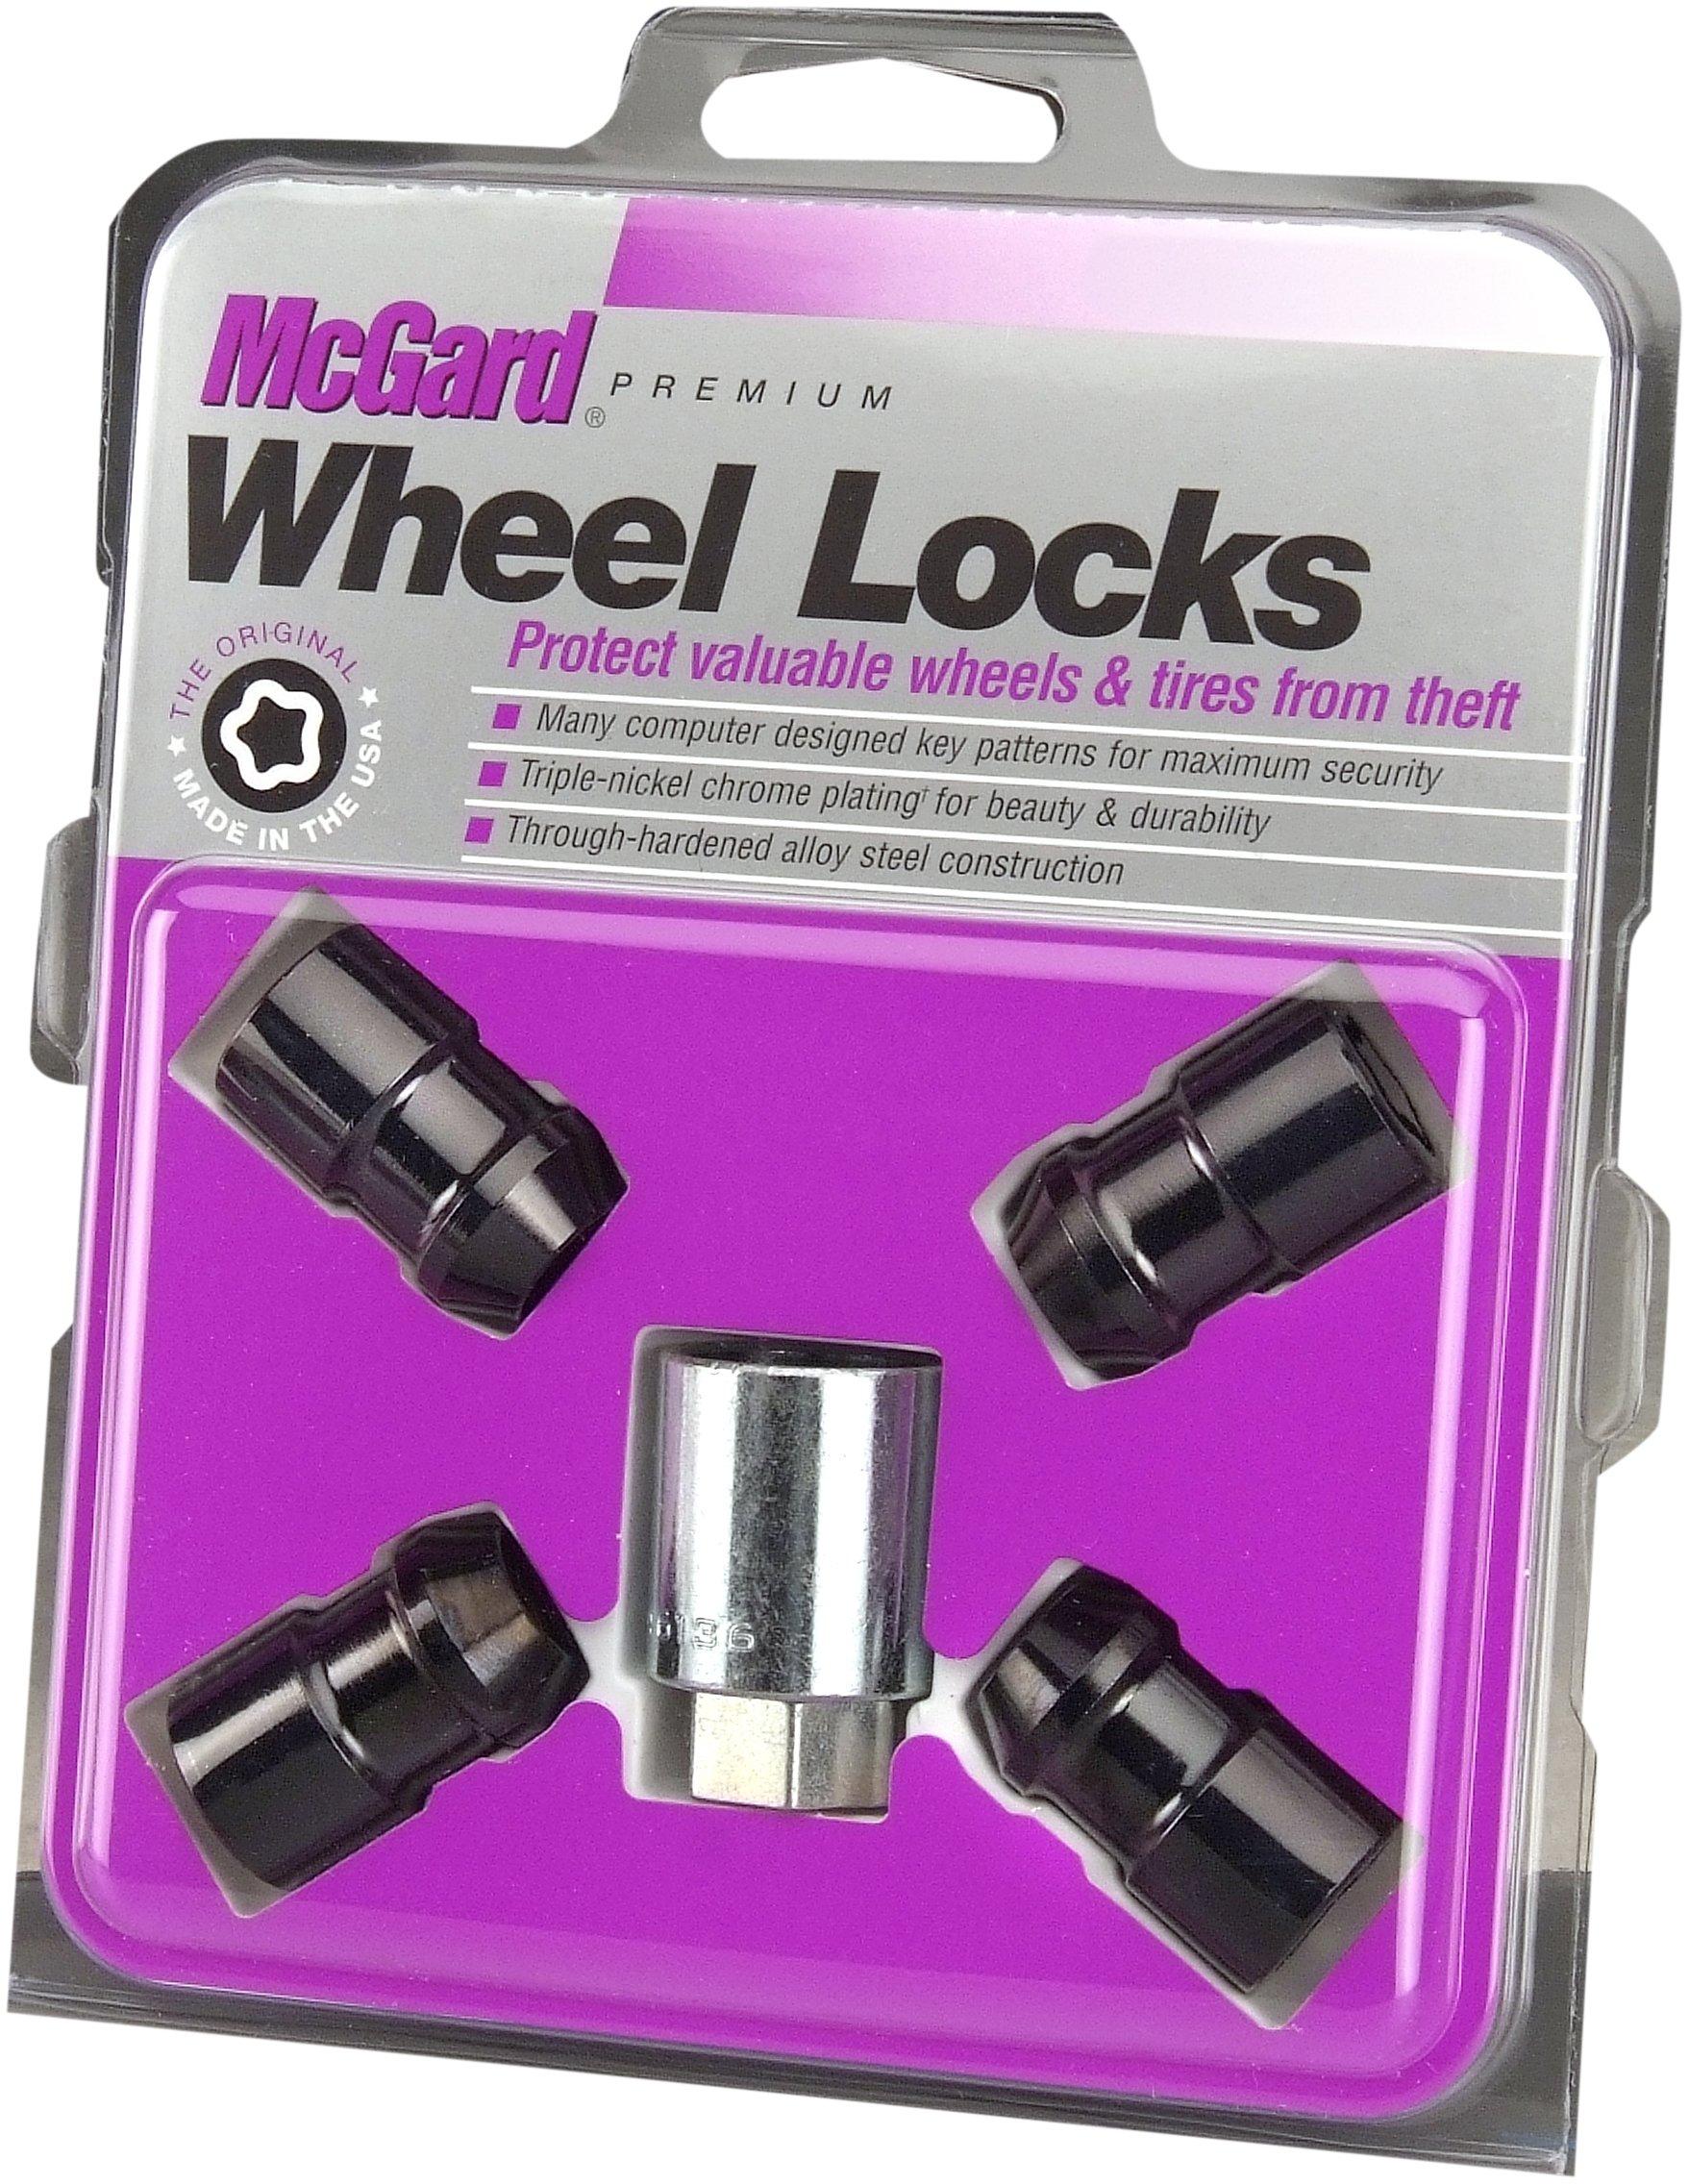 McGard 24038 Chrome/Black Cone Seat Wheel Locks (1/2''-20 Thread Size) - Set of 4